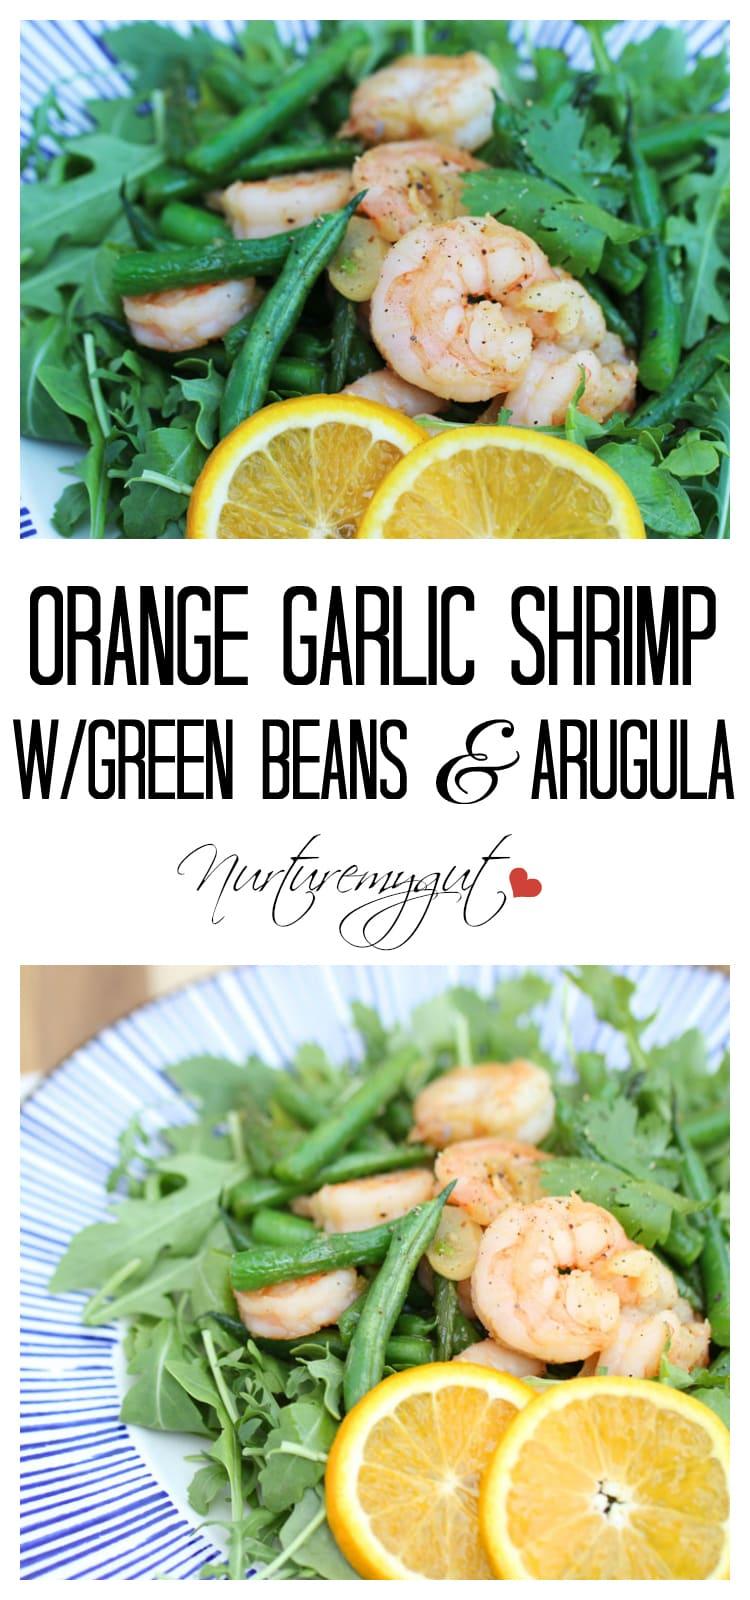 orange garlic shrimp with green beans and arugula